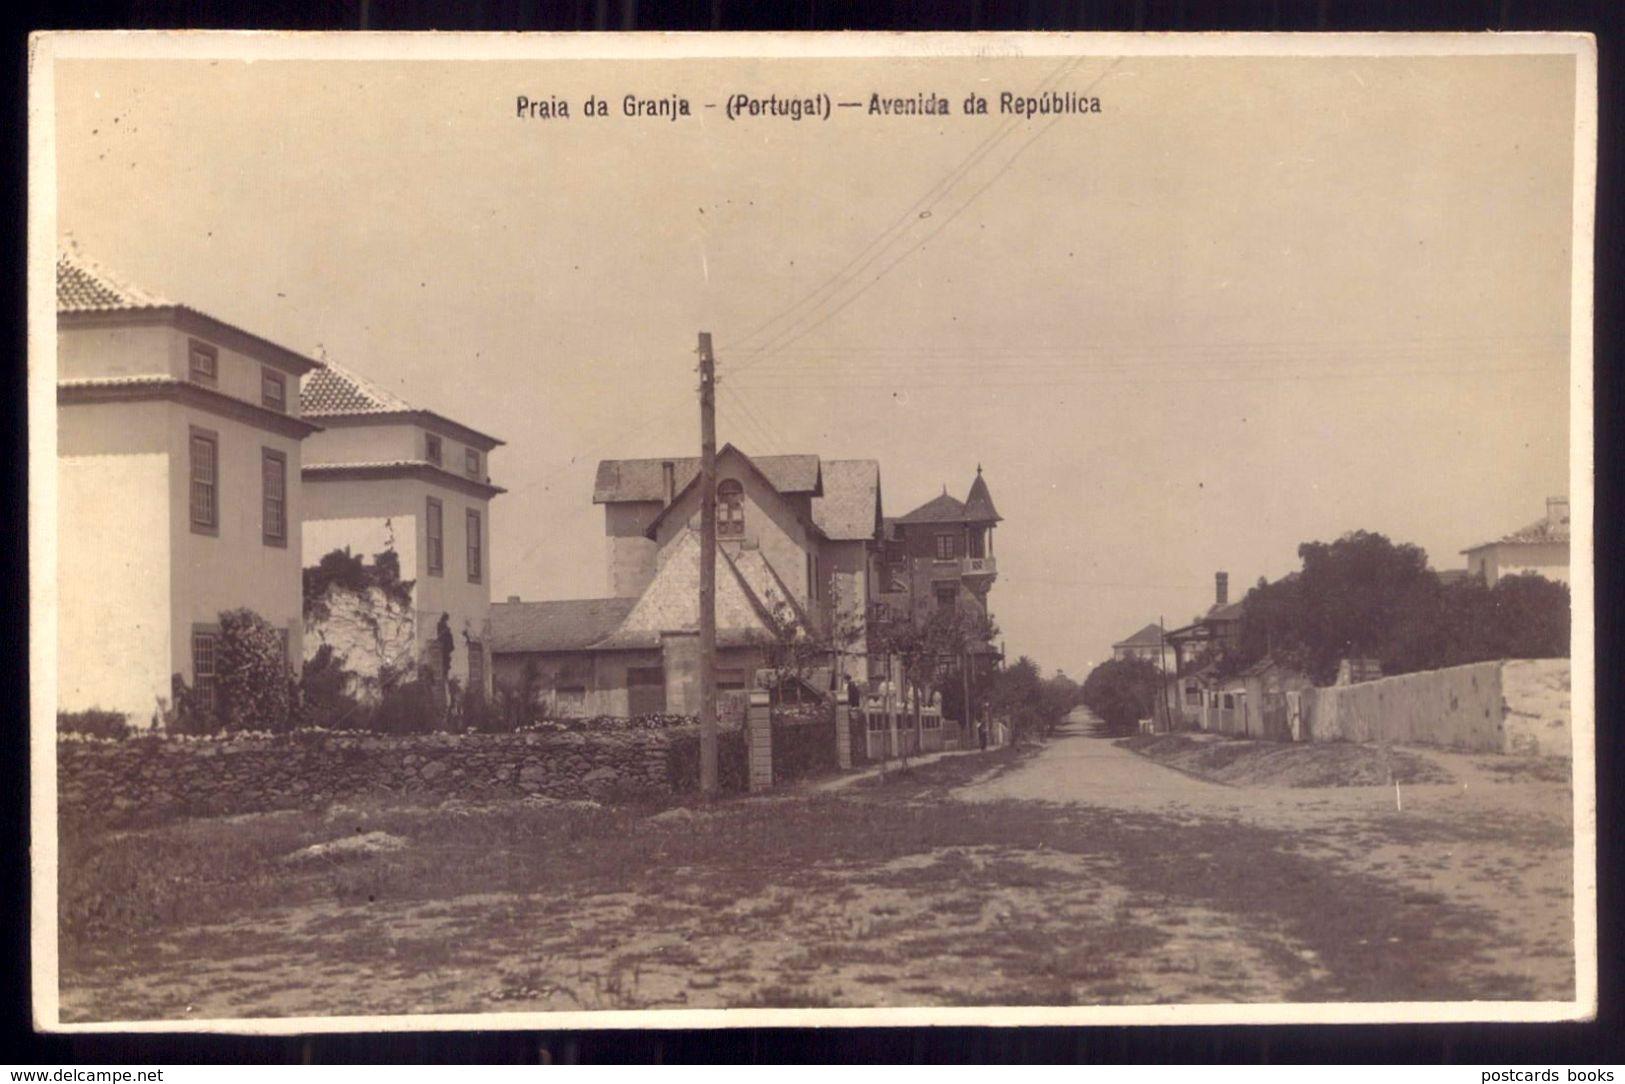 Postal Fotografico Da PRAIA Da GRANJA - Avenida Da Republica - VILA NOVA De GAIA - Old Postcard (PORTO) Portugal - Porto